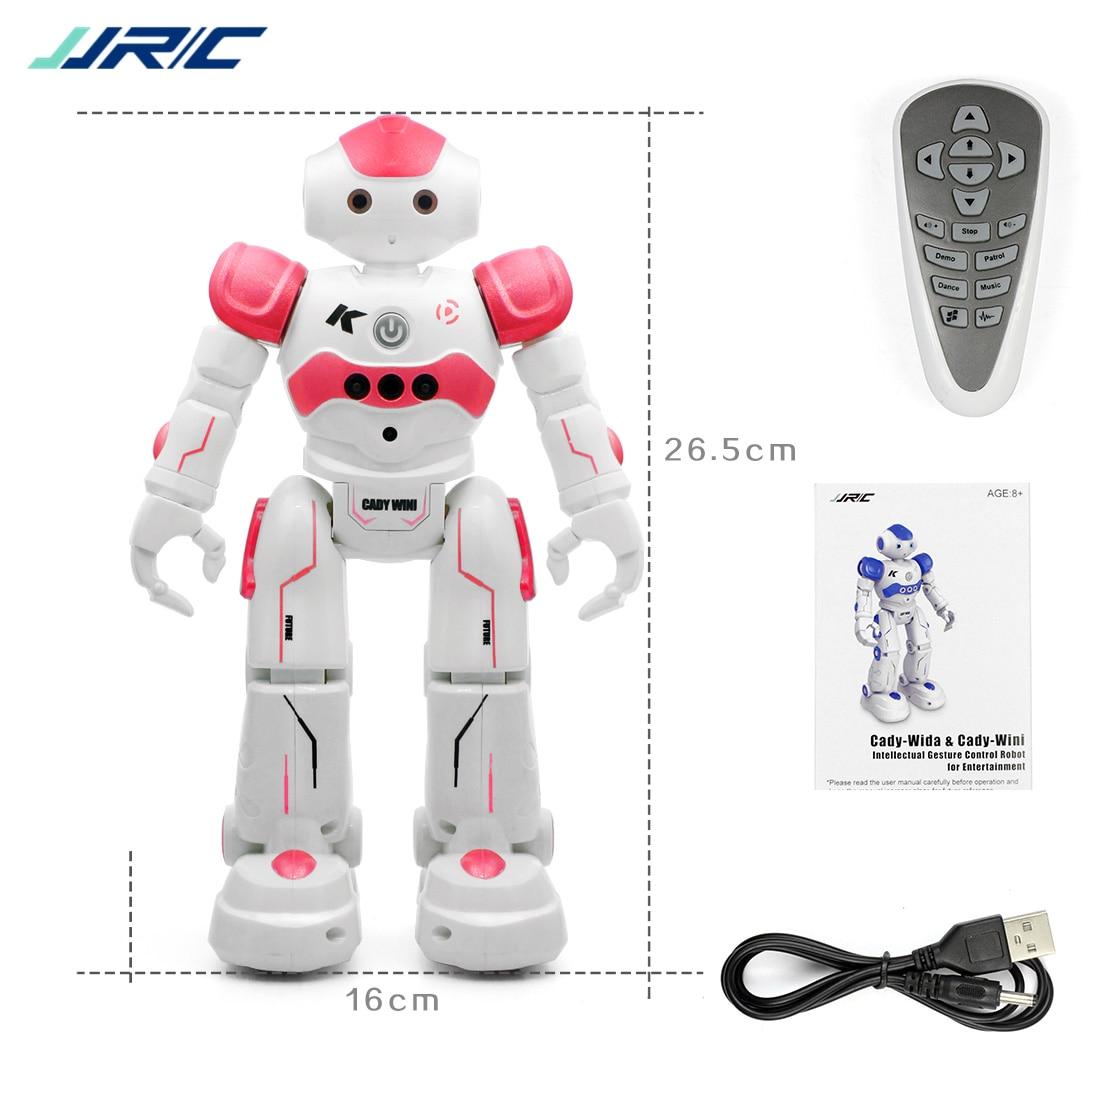 JJRC R2 RC Robot Gesture Sensor Dancing Intelligent Program CADY WIDA Toy Accessory F22252/53 intelligent sensor aircraft toy